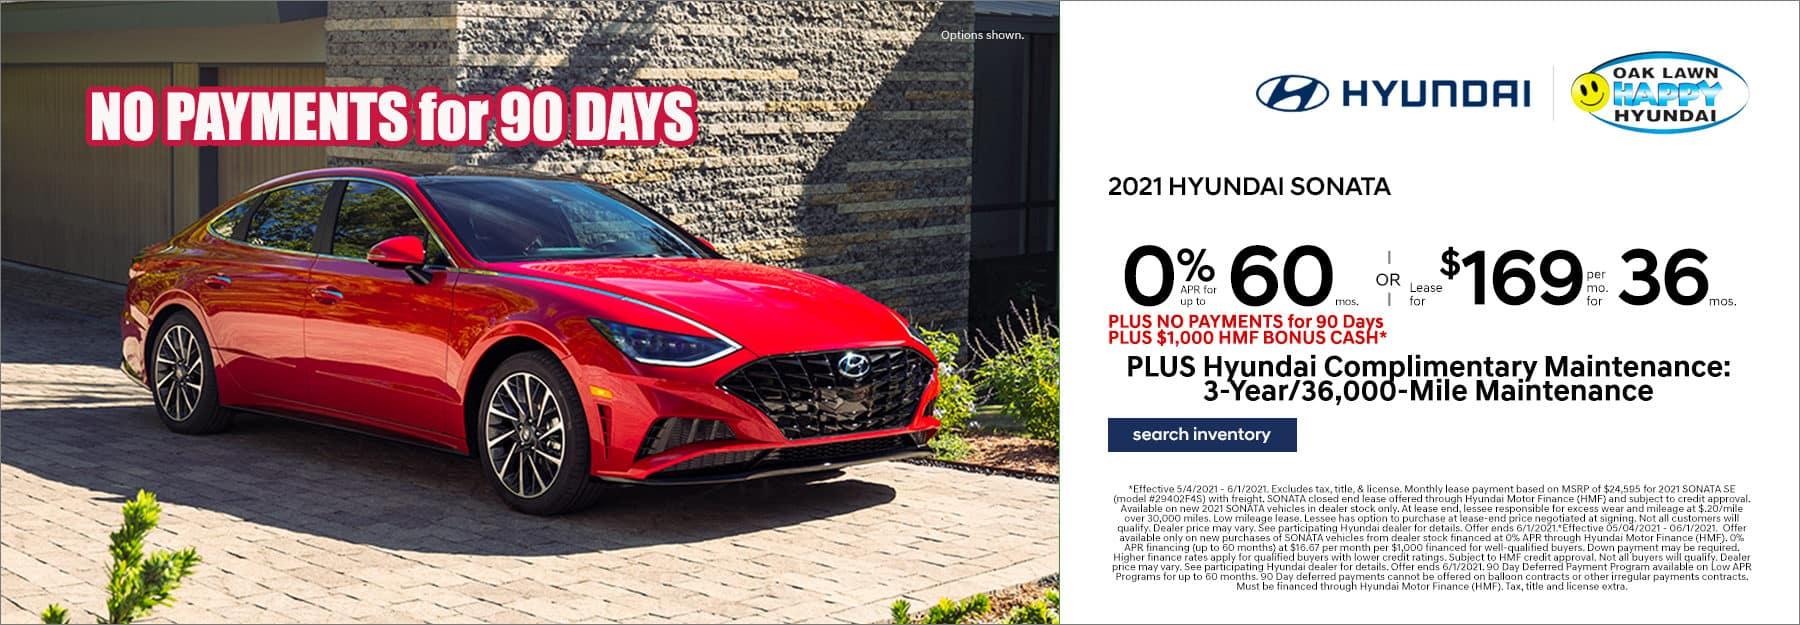 RR_May_2021_Sonata_HAPPY Hyundai